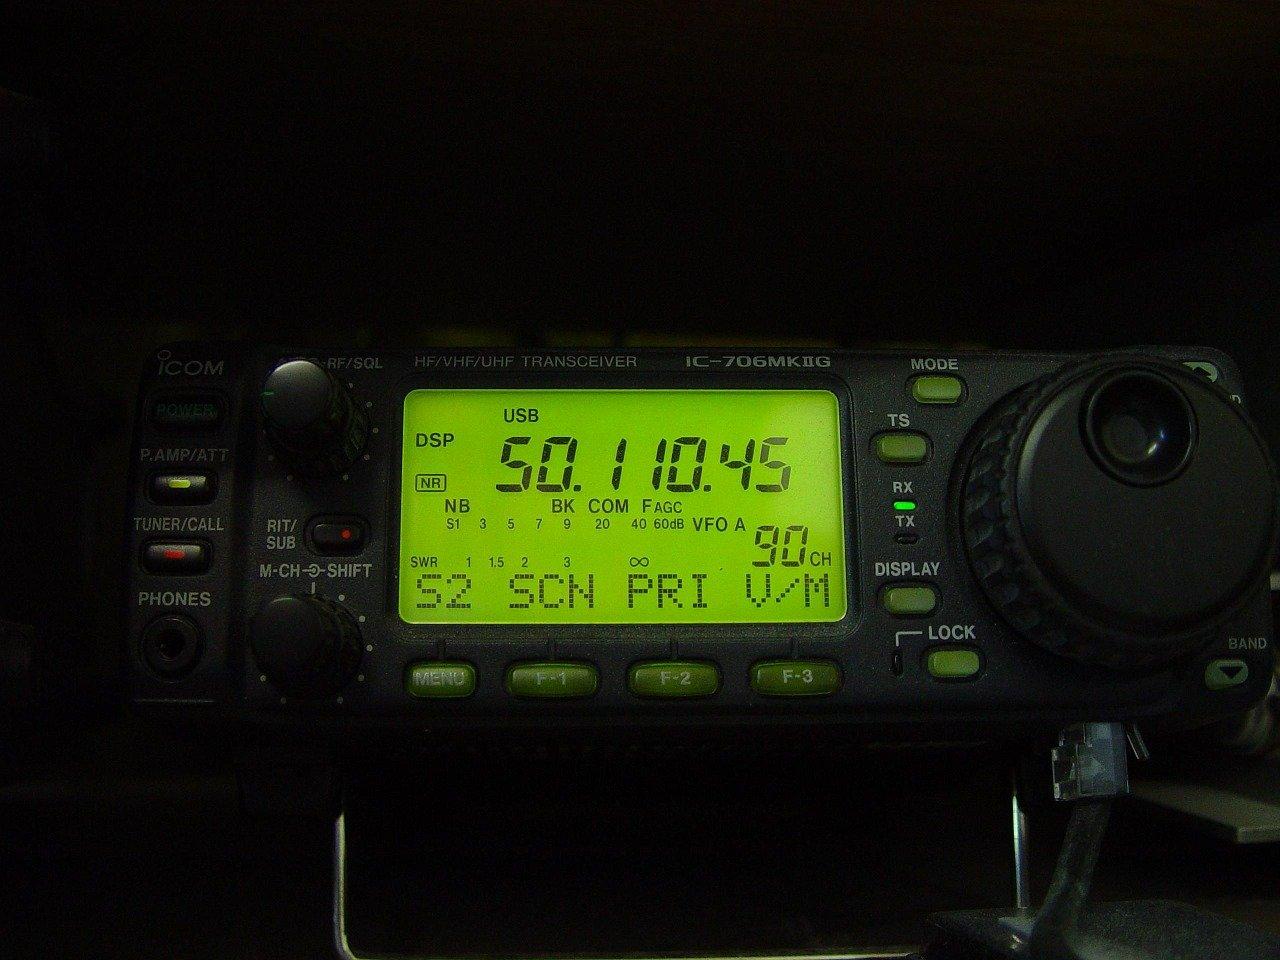 vhf overleg met Radio medische dienst